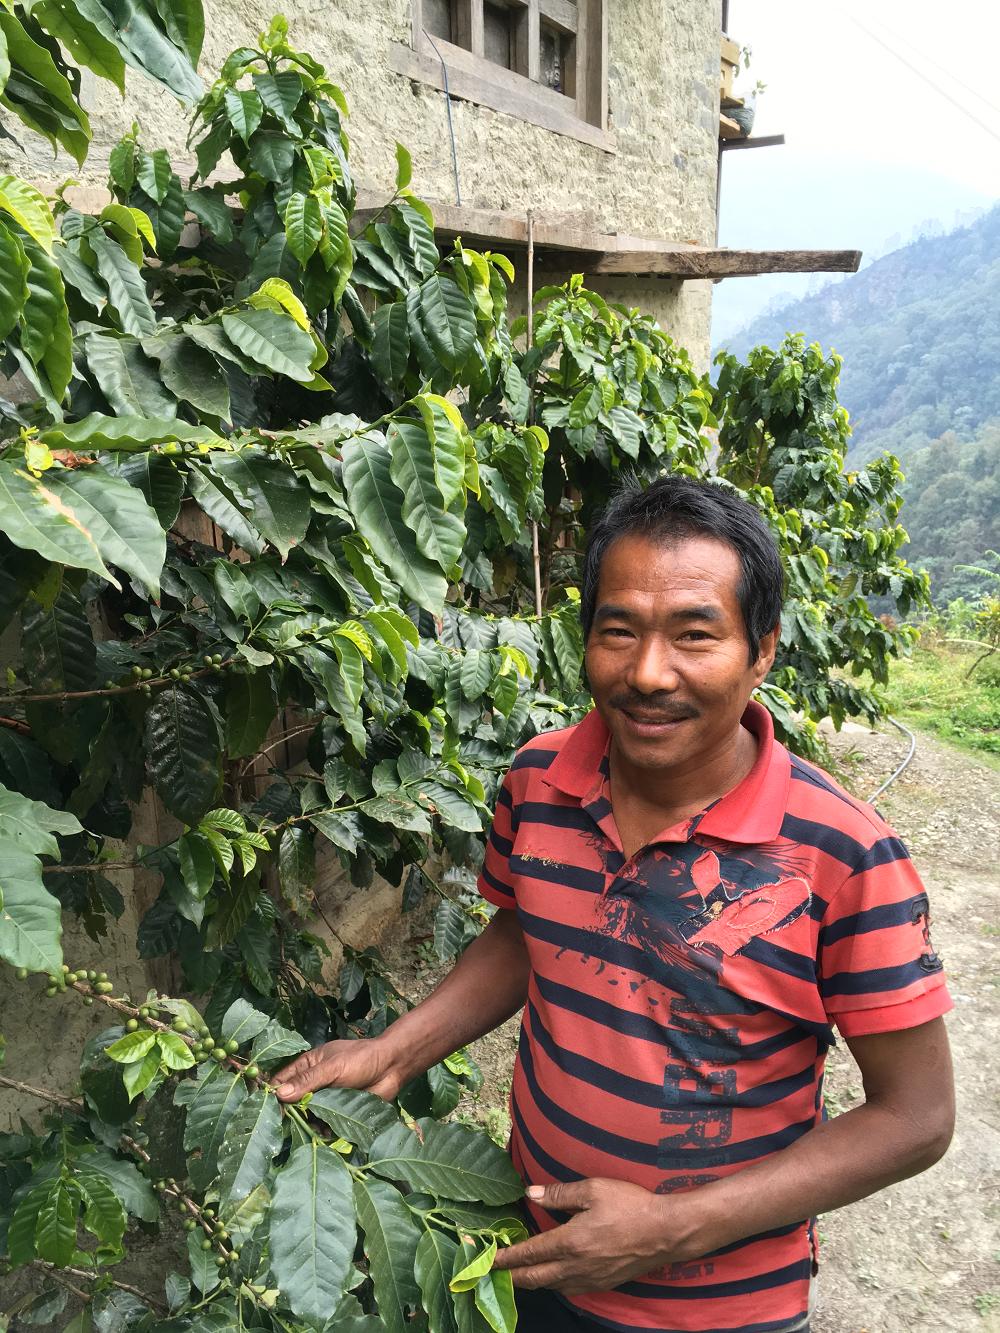 Dilisher Rai with his coffee plant in Deusa, Solukhumbo. (February, 2017)